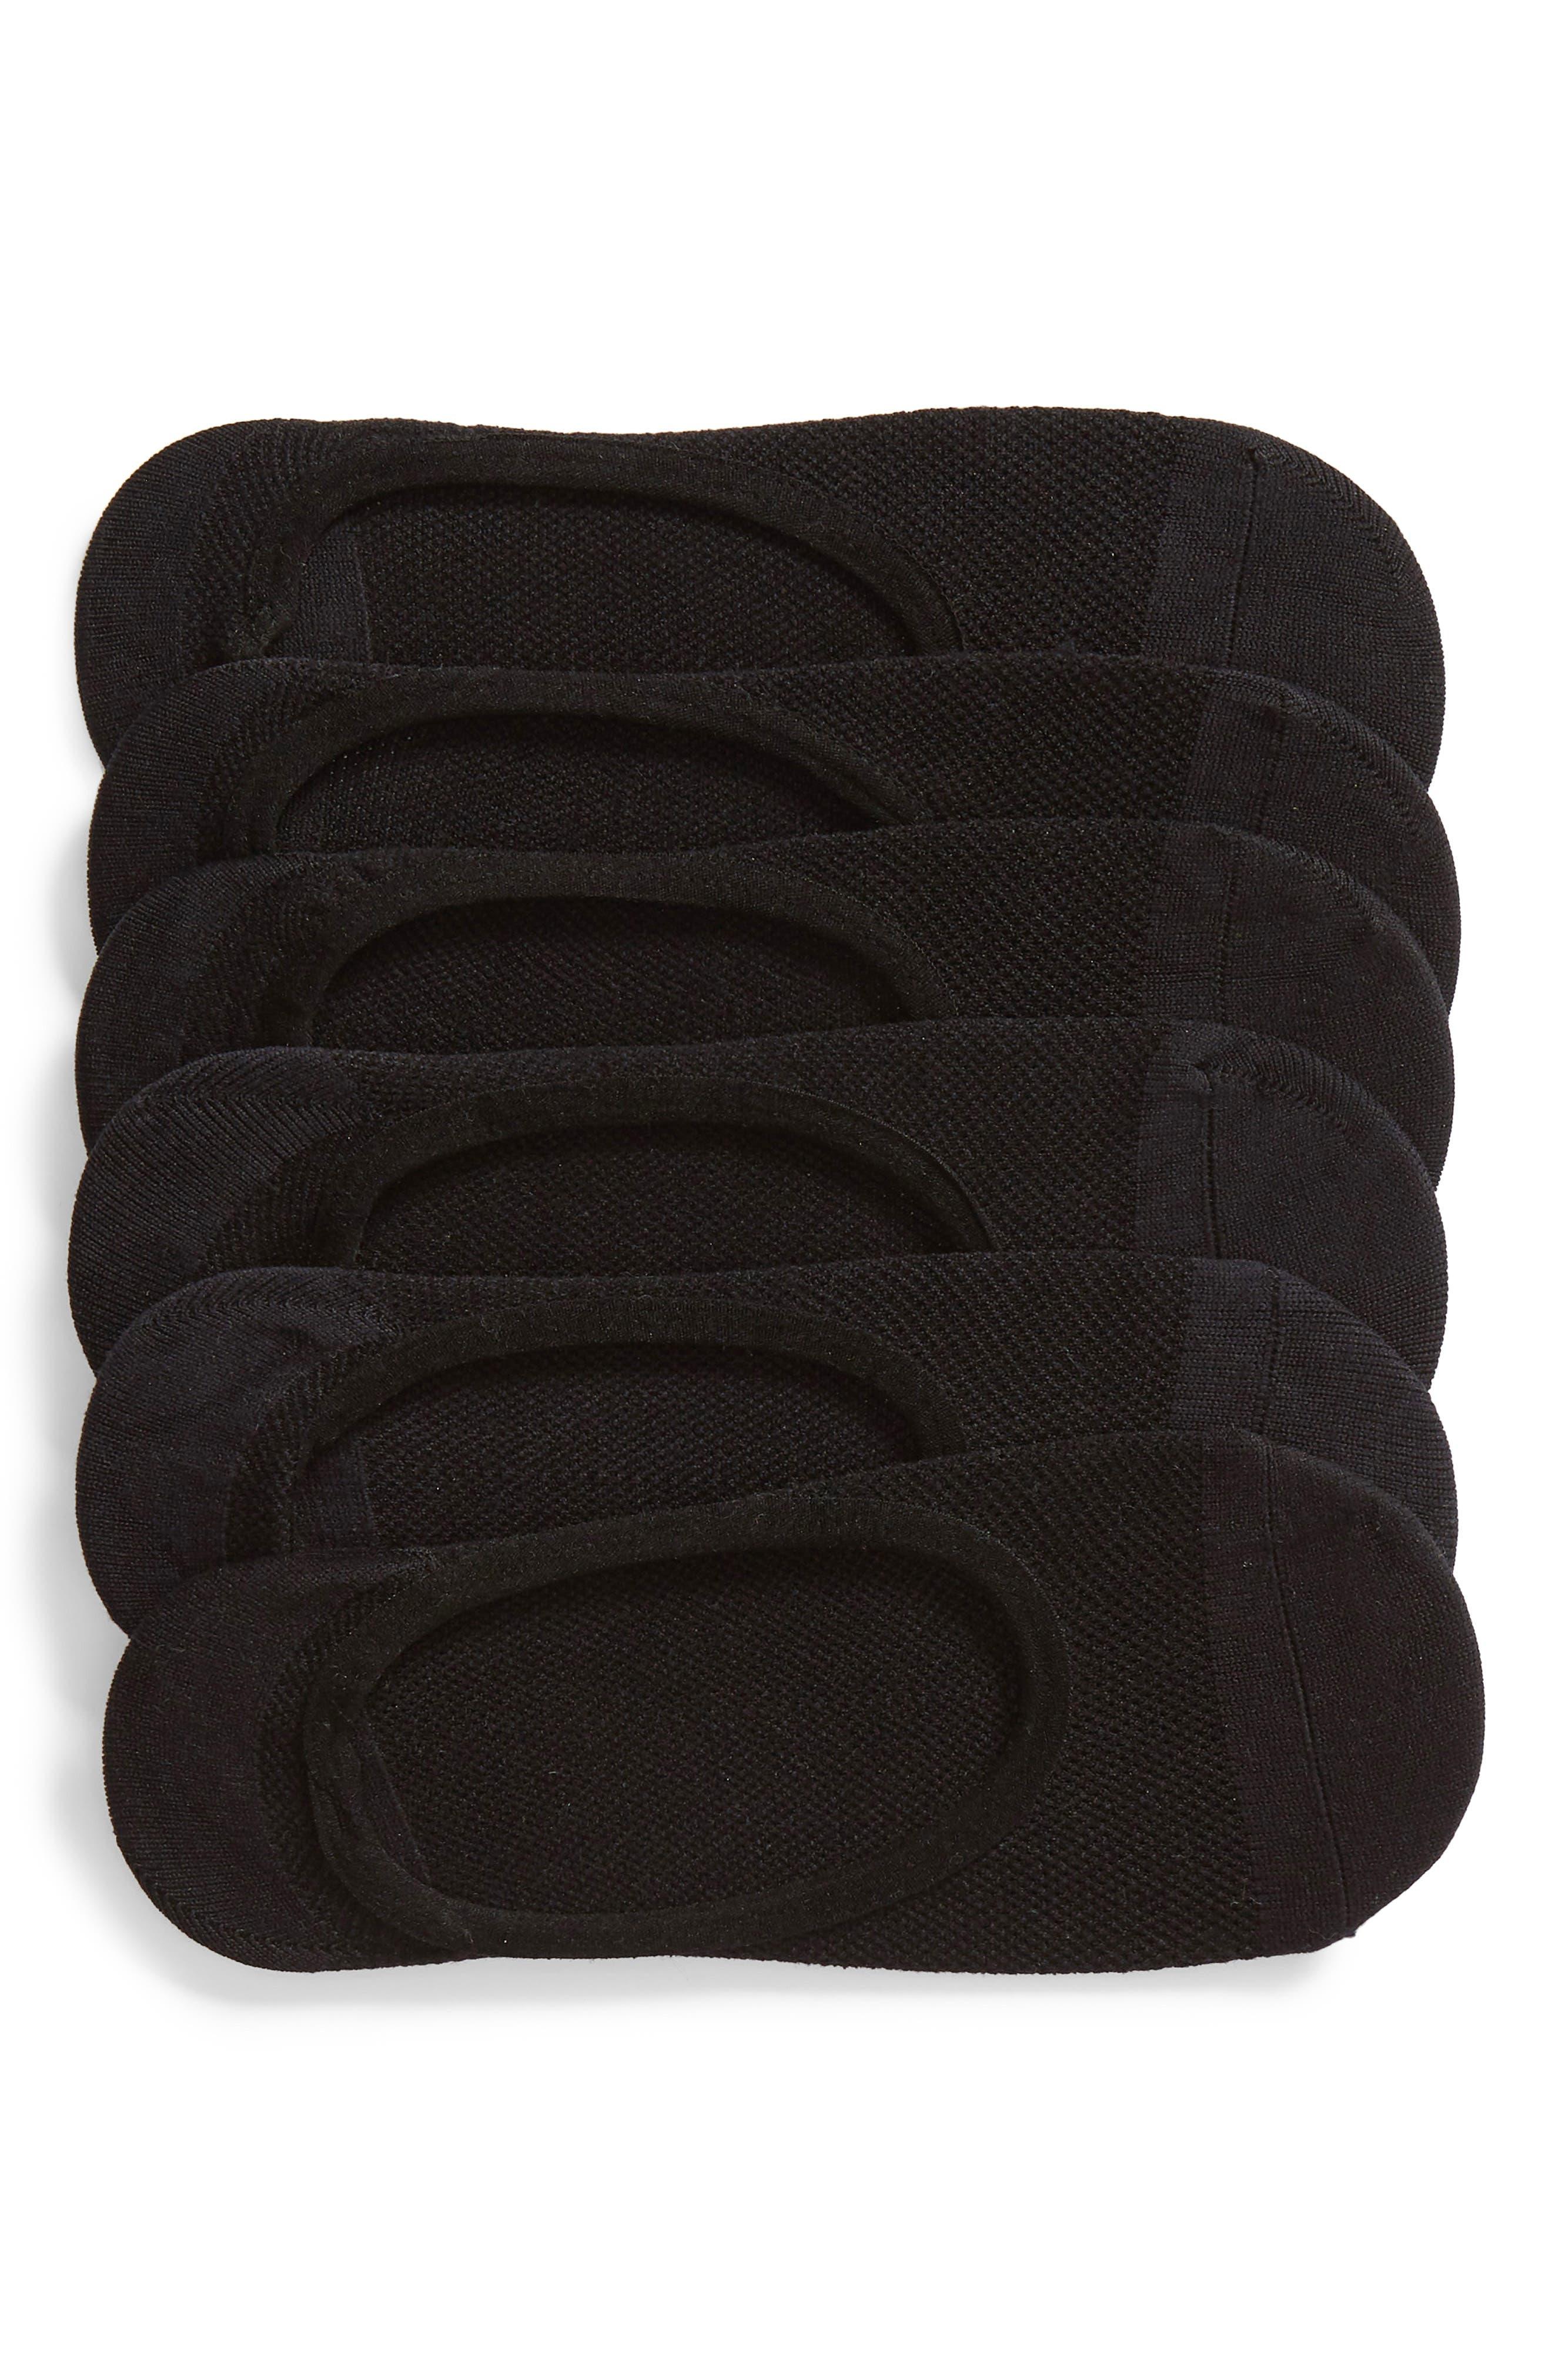 6-Pack No-Show Liner Socks,                             Main thumbnail 1, color,                             BLACK